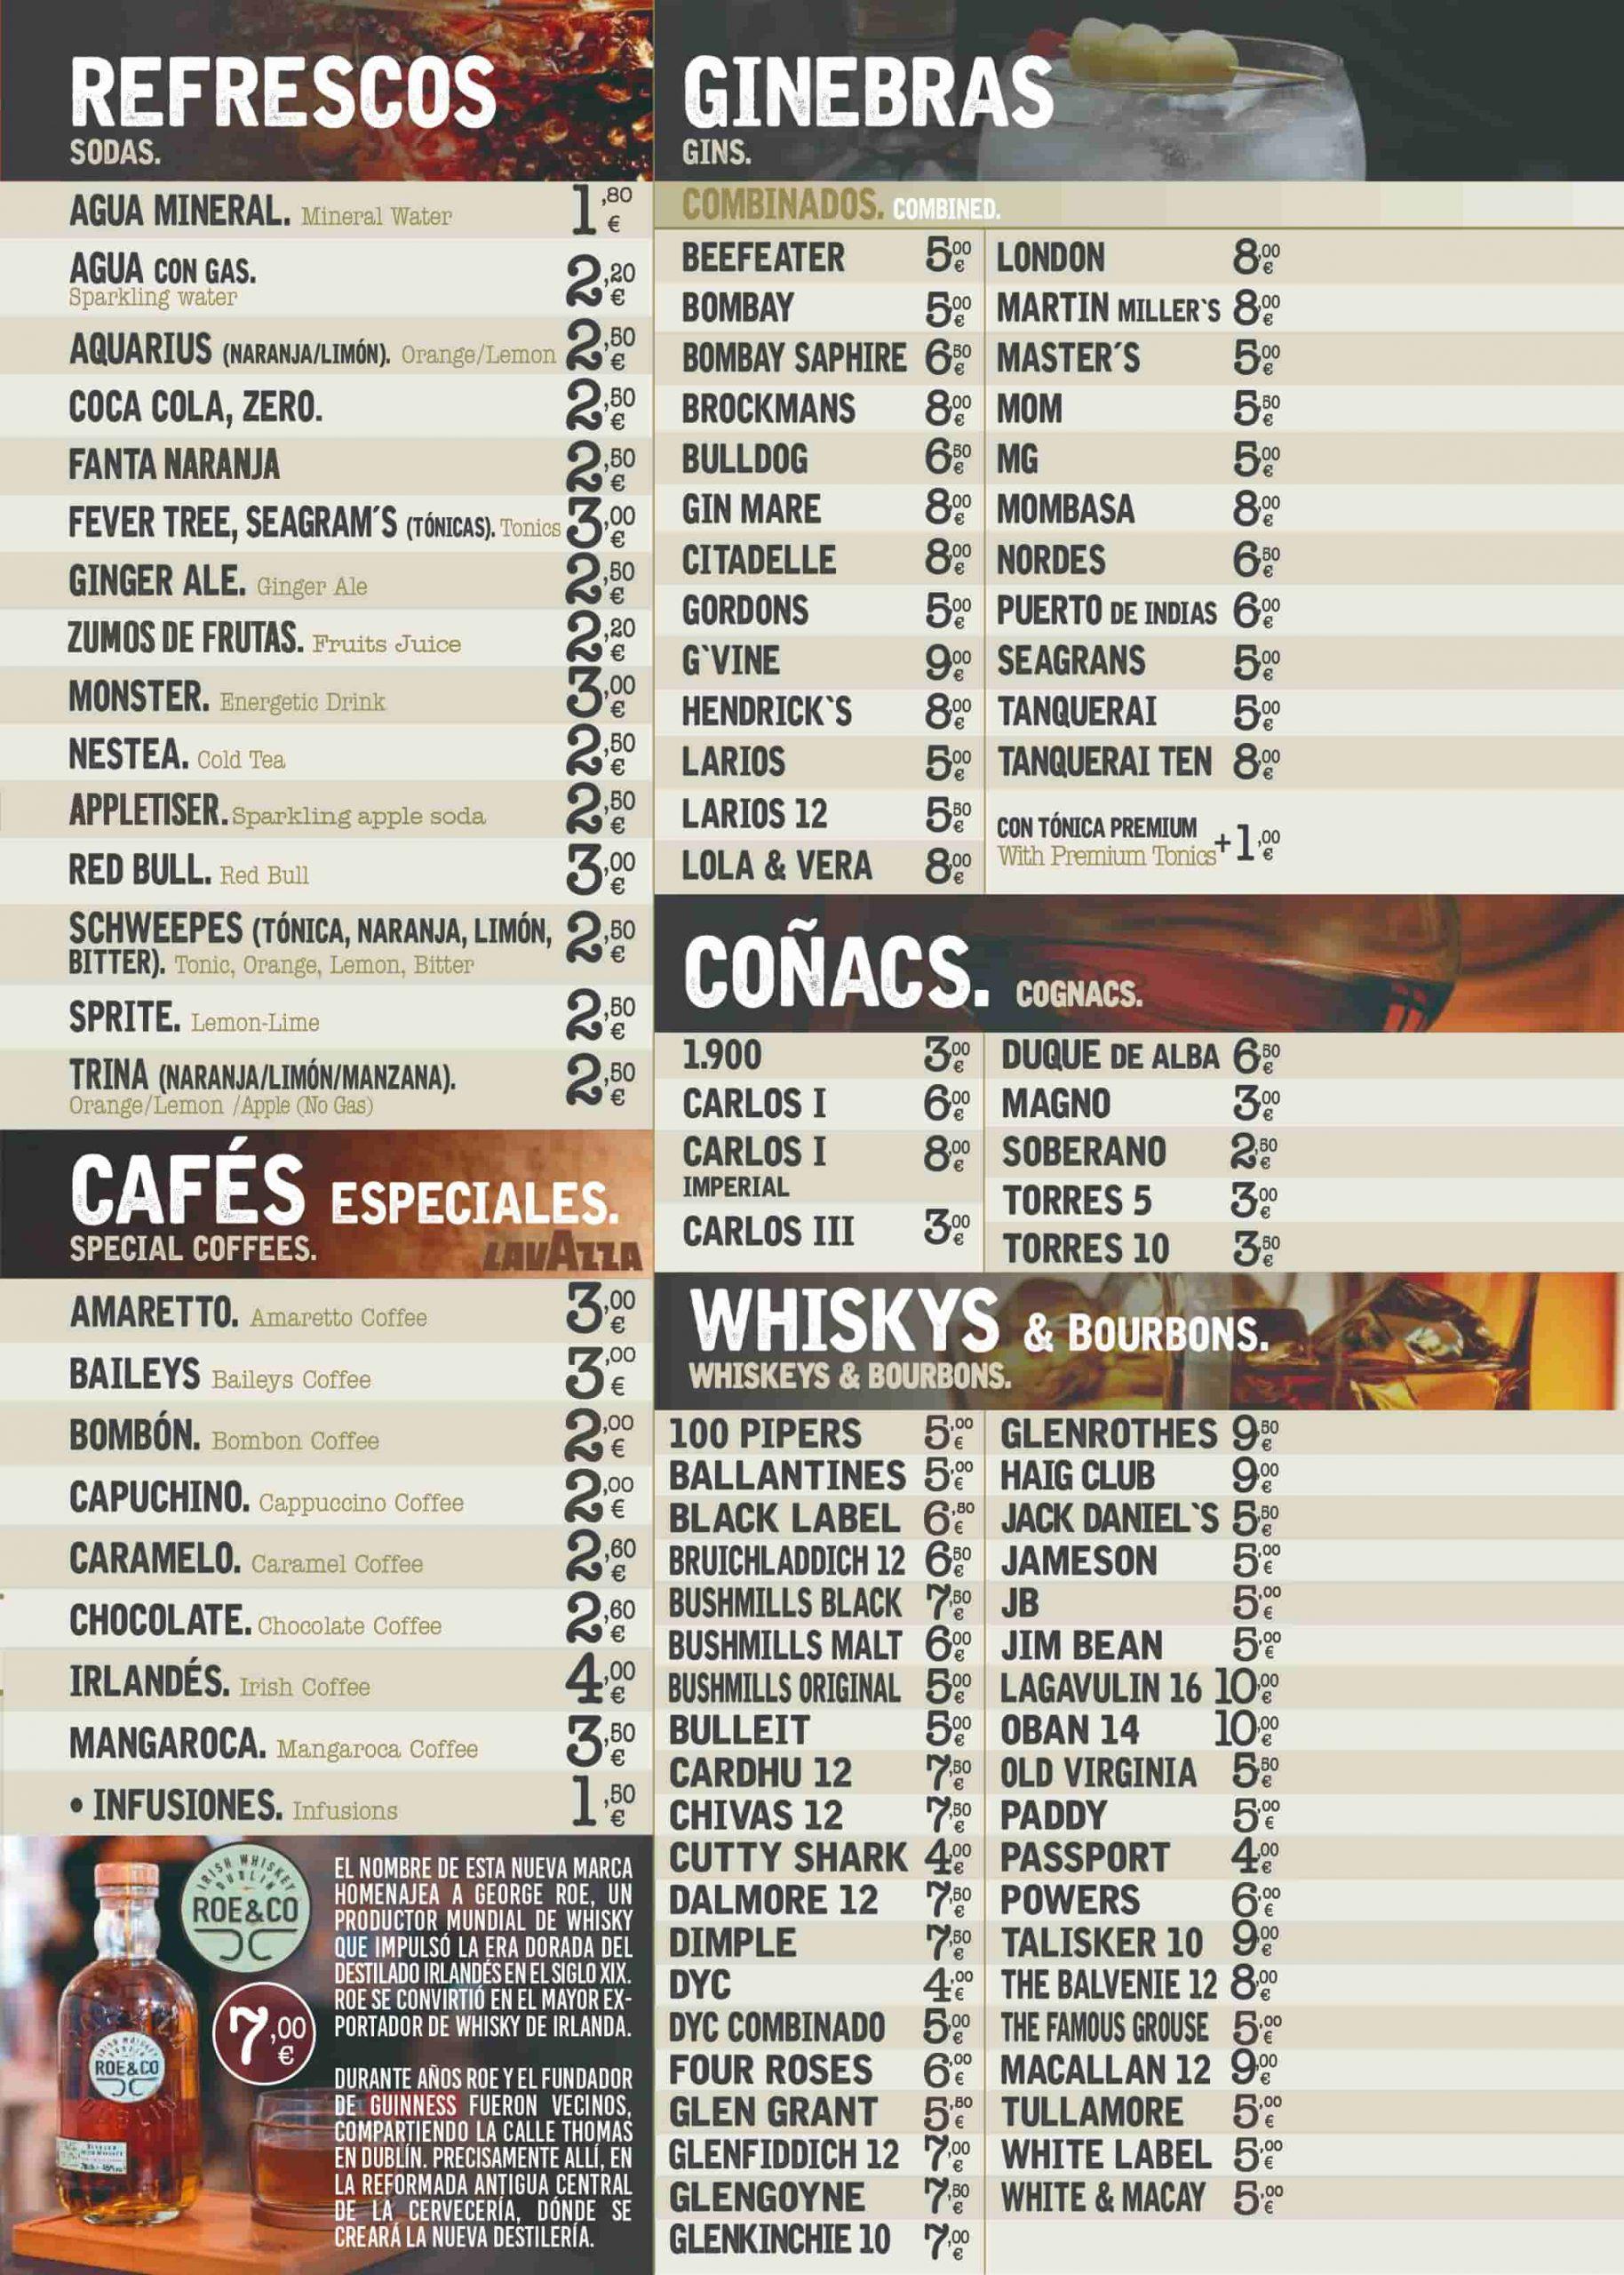 refrescos, cafés, cognacs, ginebras y whisky